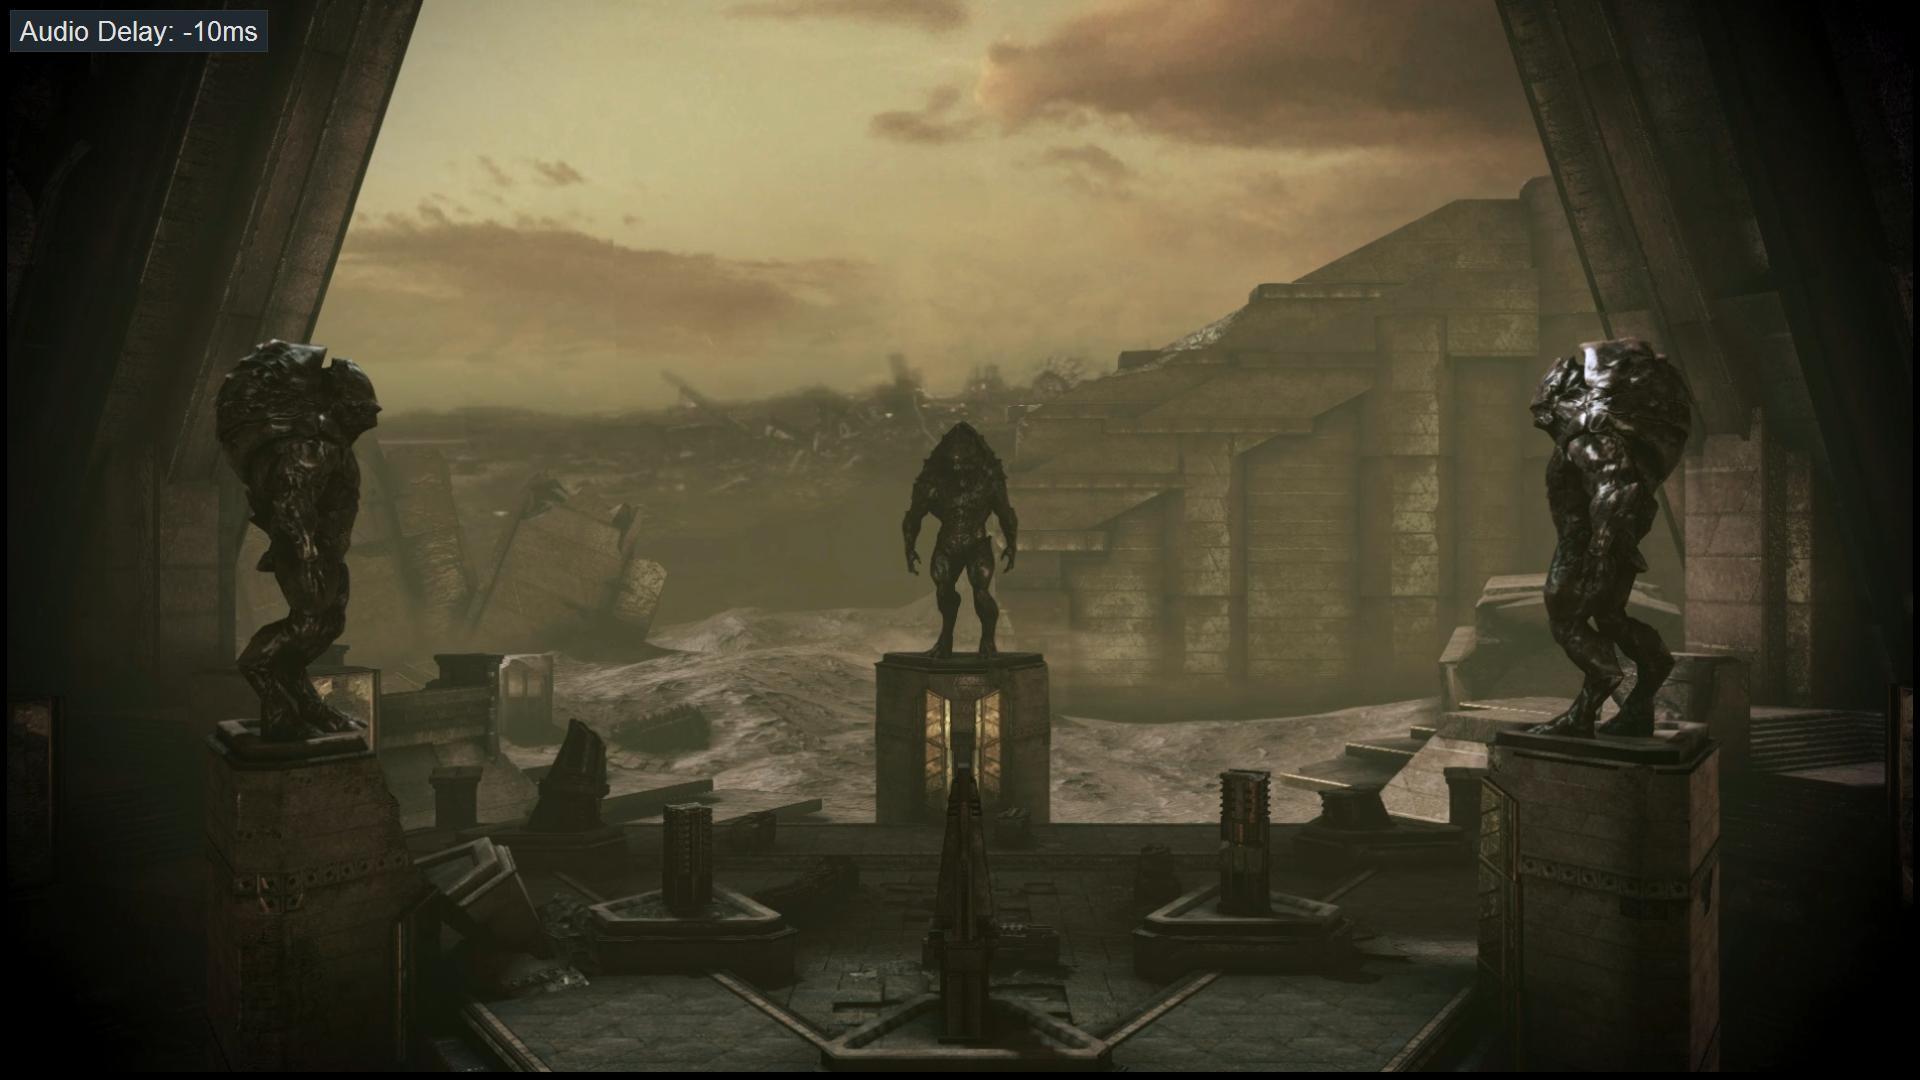 Mass Effect 3 Tuchanka Statues Dreamscene by droot1986